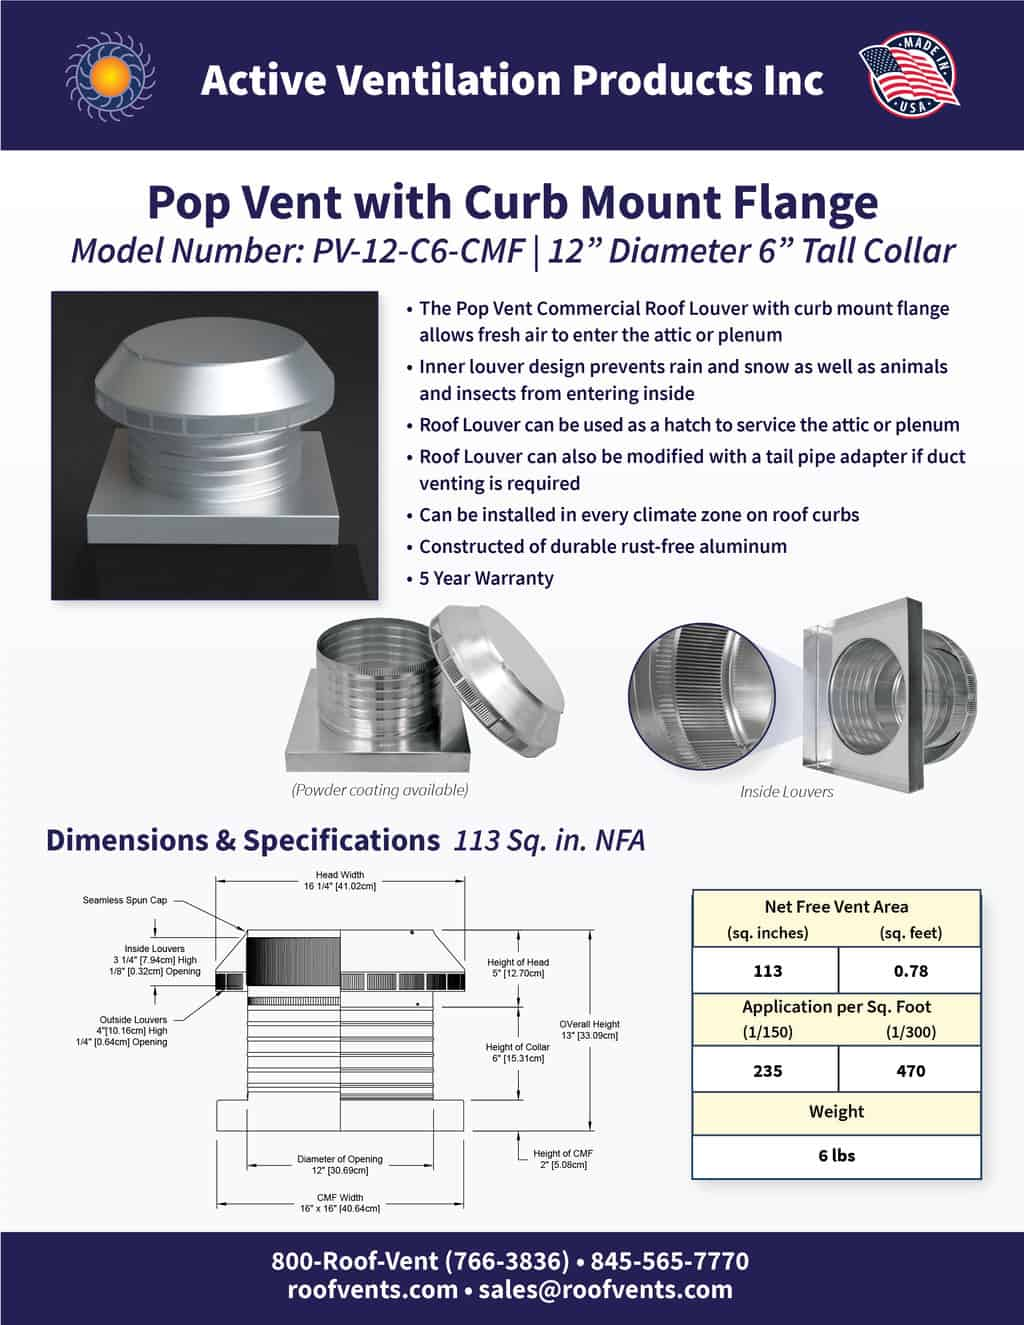 PV-12-C6-CMF-brochure